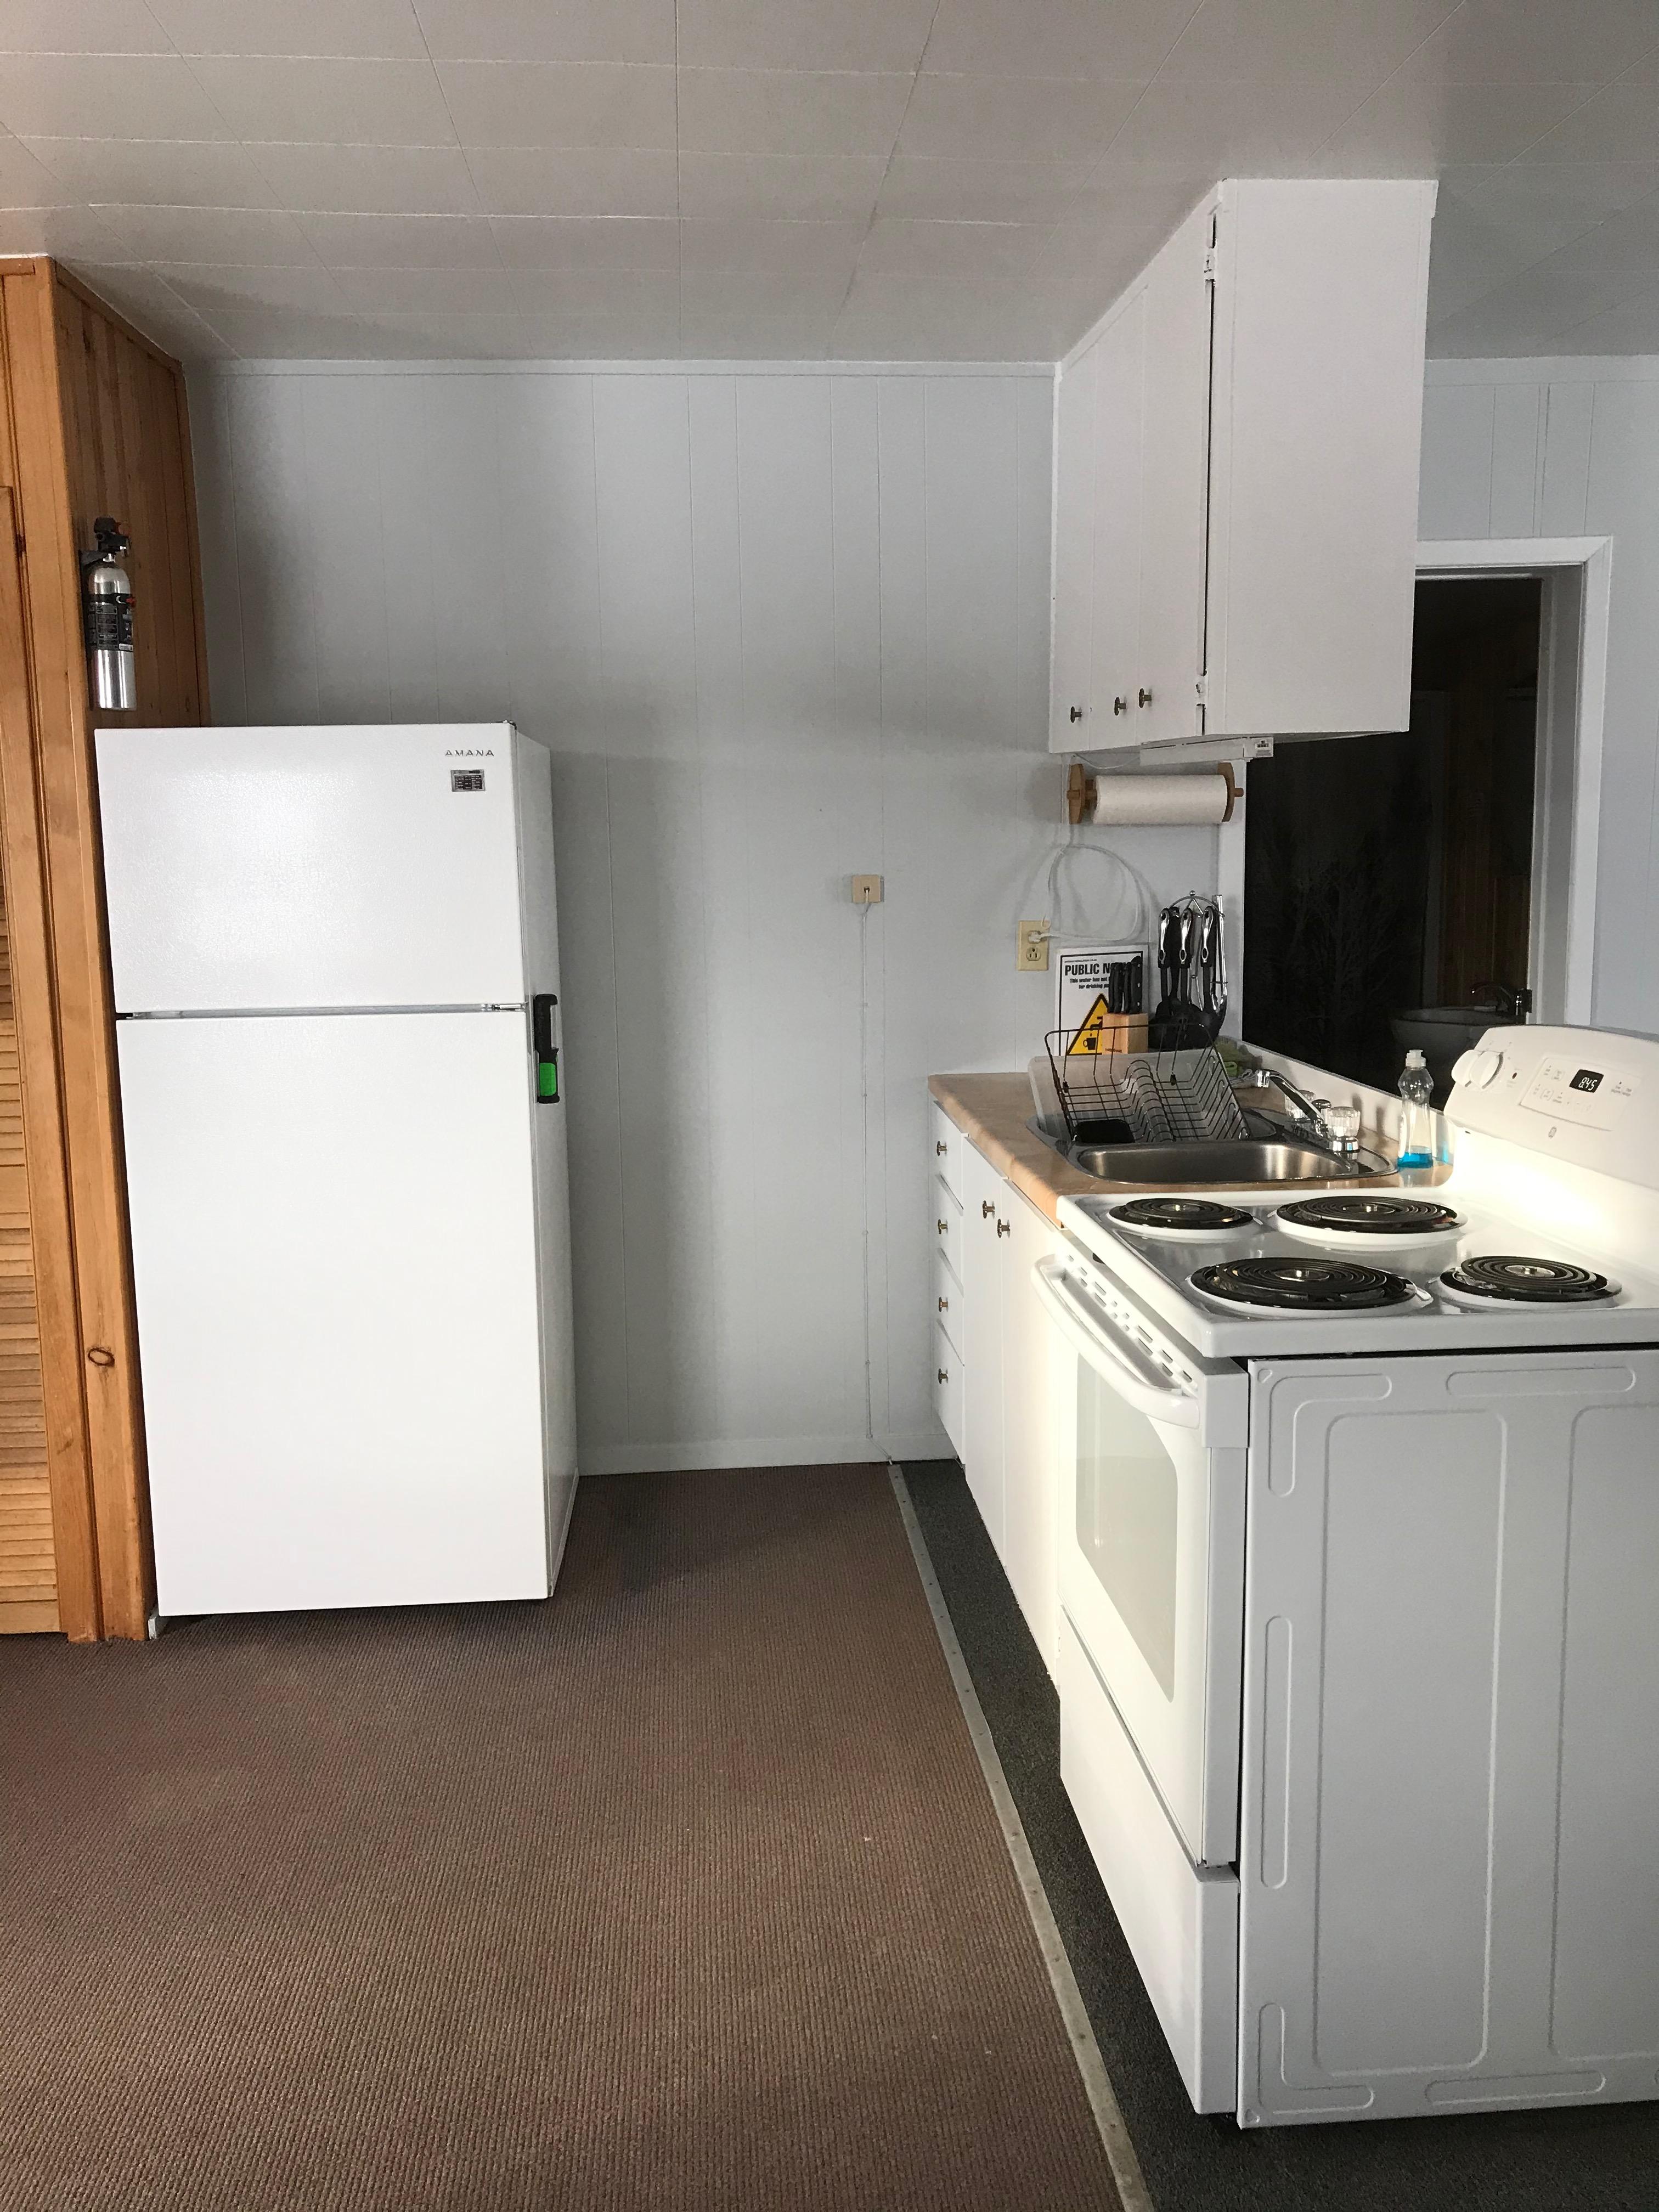 Cabin 2 open kitchen area